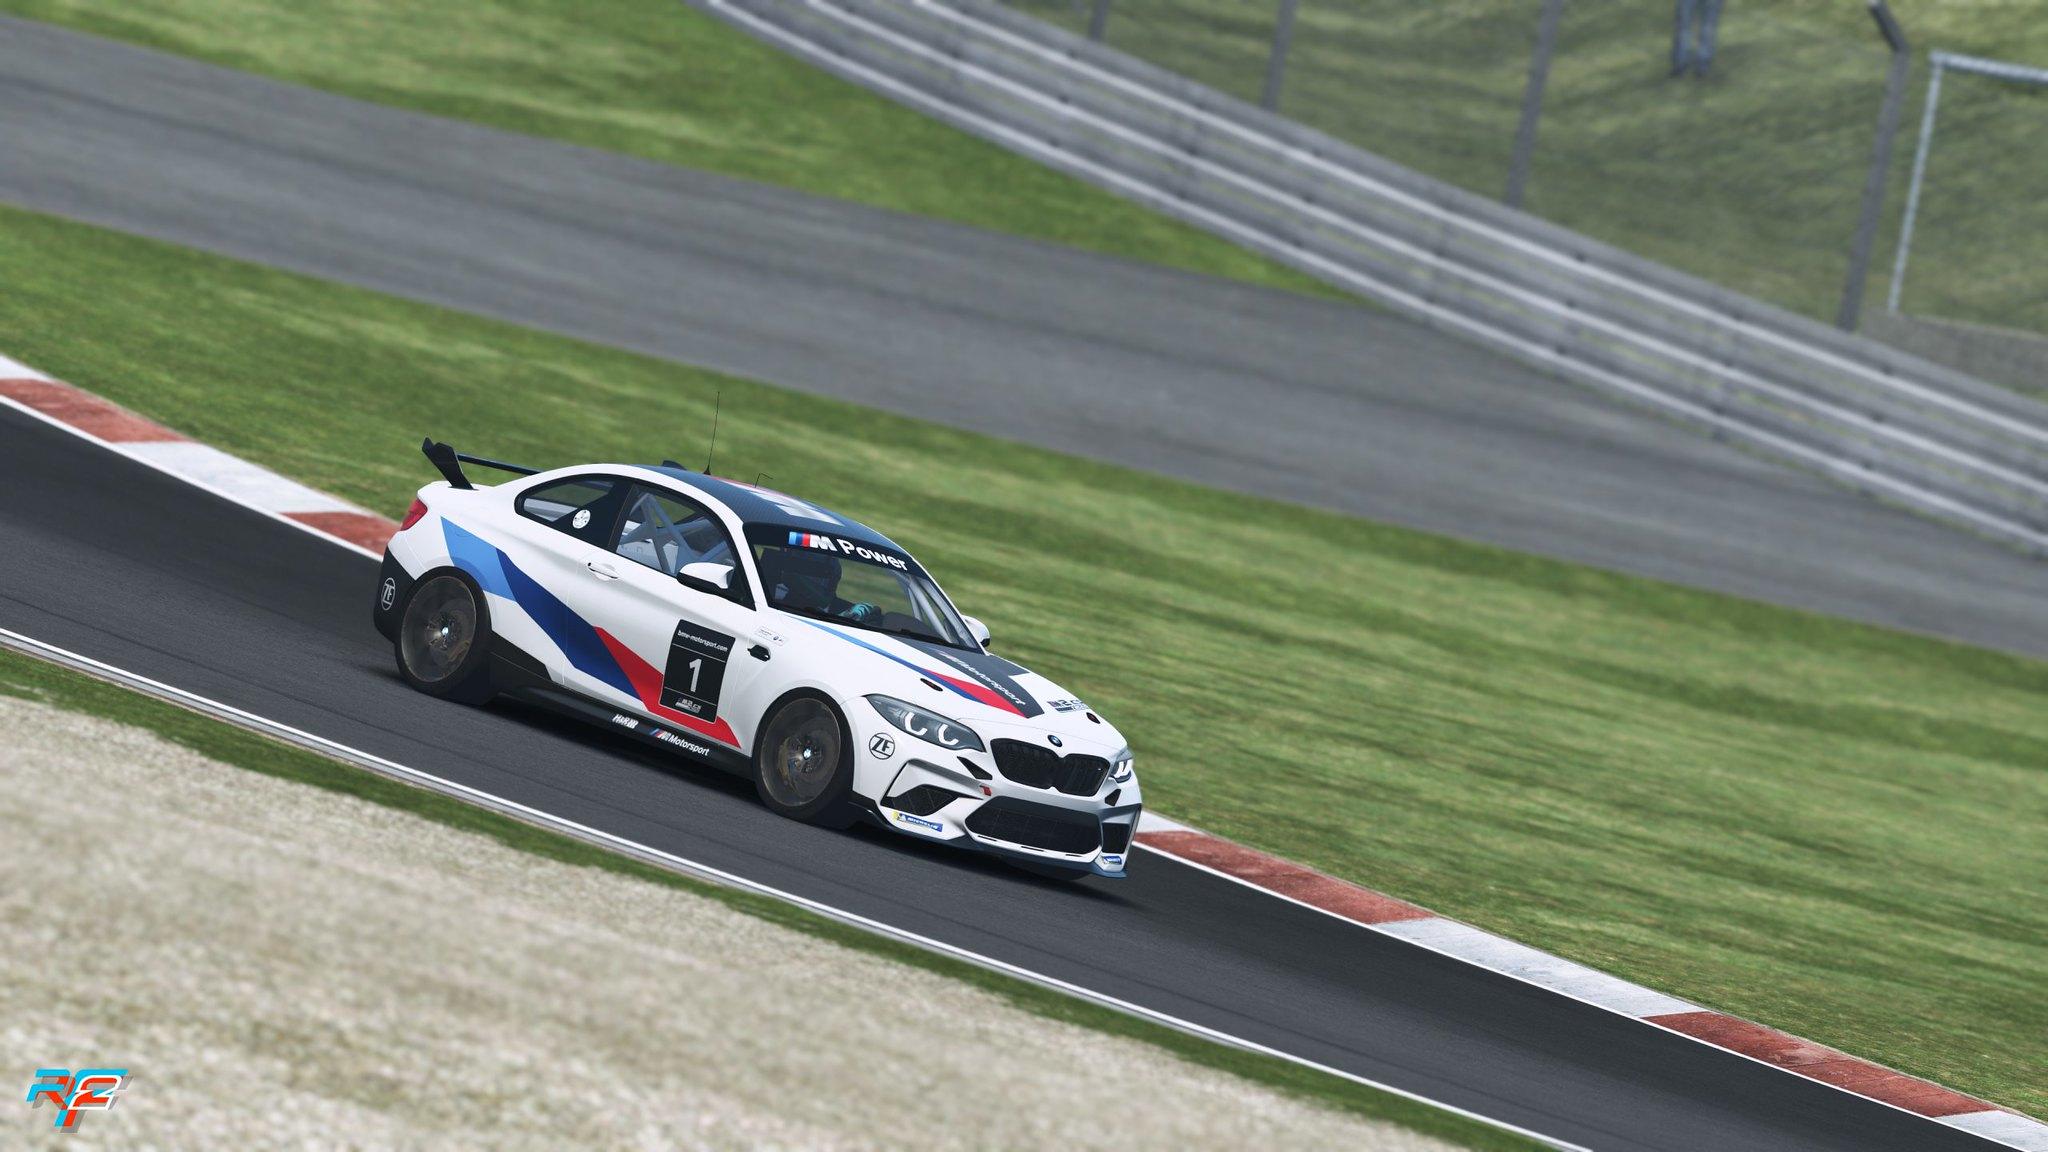 BMW_M2_2020_screenshot_04-scaled